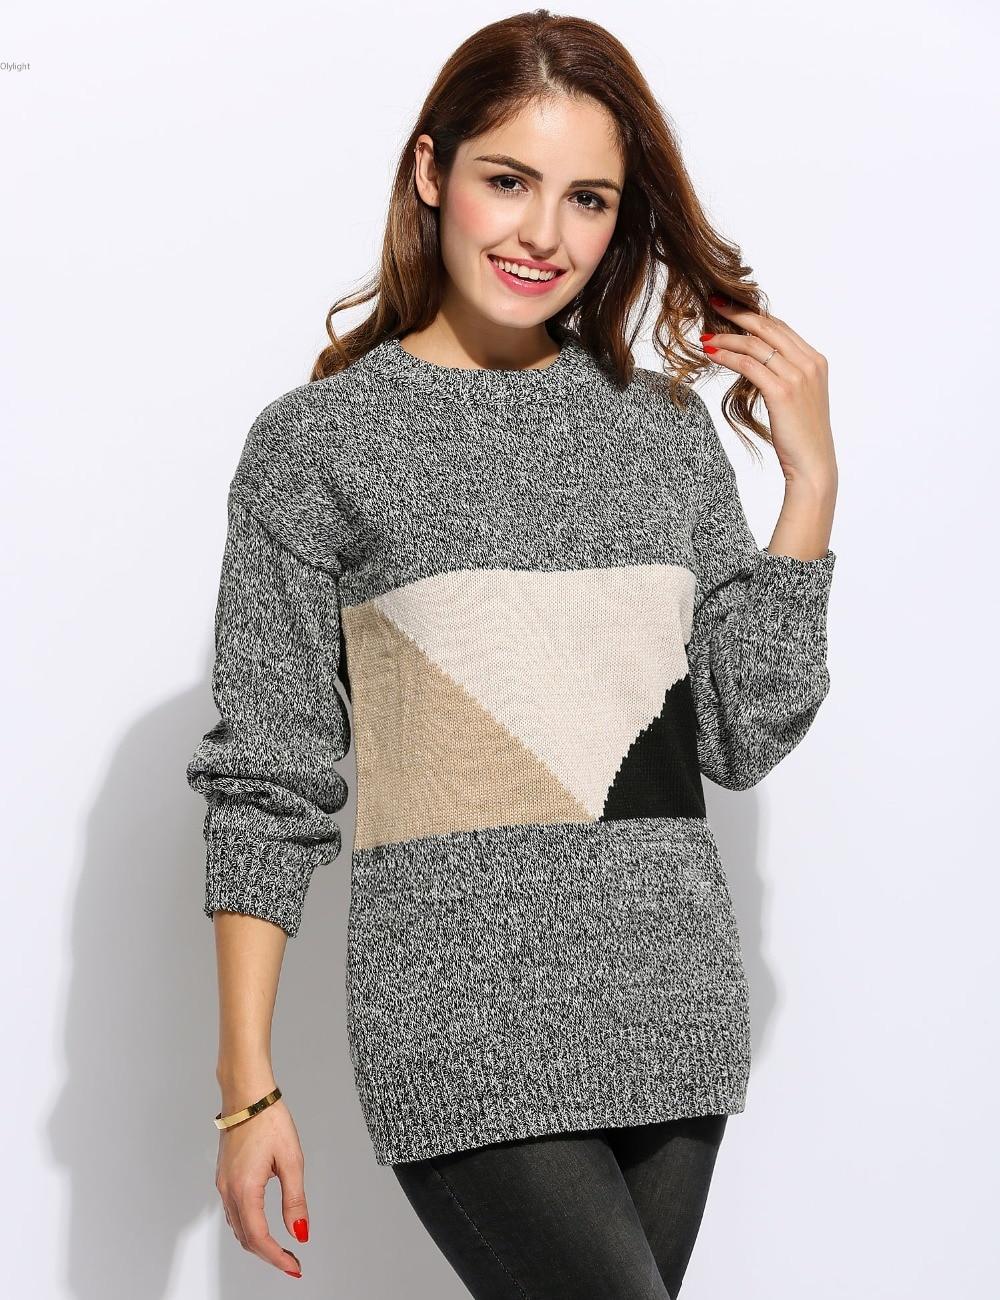 48c72c1110dd Women Casual Long Raglan Sleeve Pullover Sweater Round Neck ...